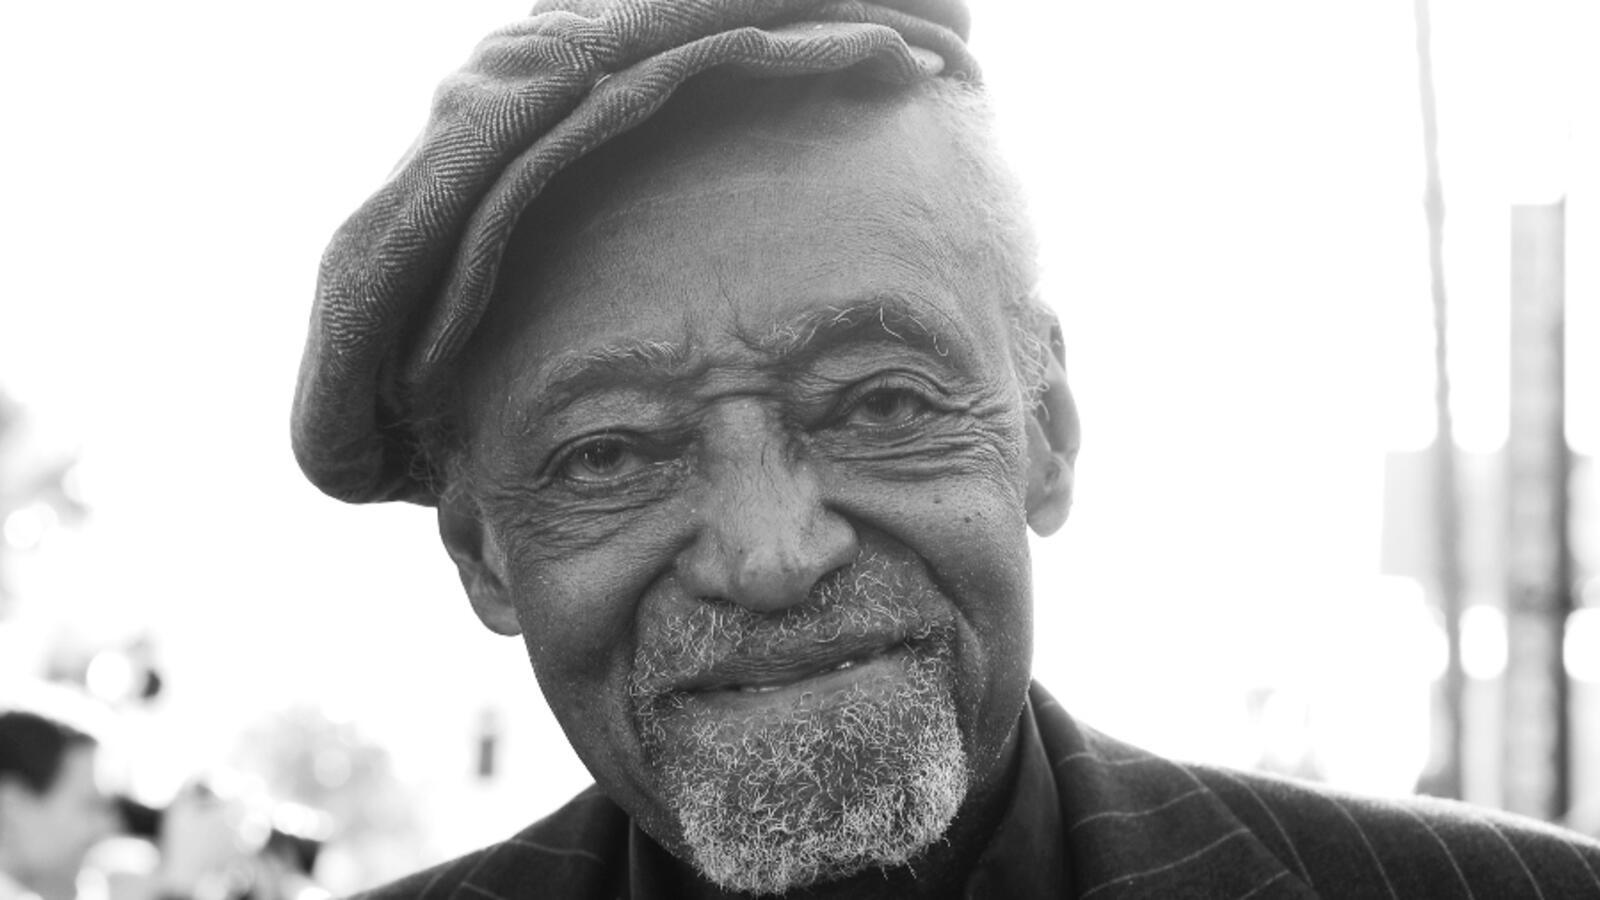 Legendary Actor, Writer, Director Melvin Van Peebles Dies At 89